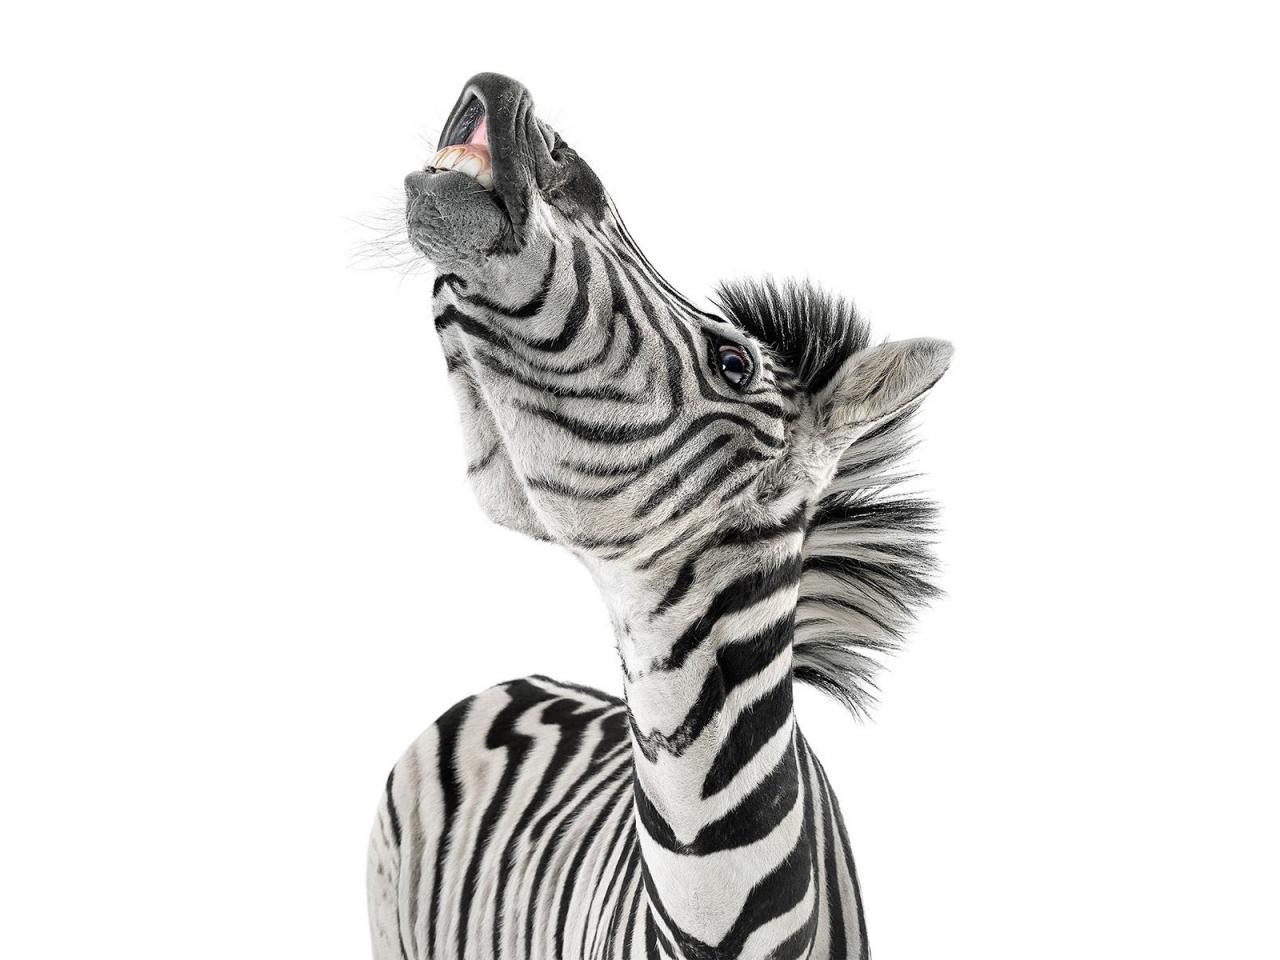 Cebras graciosas - 1280x960